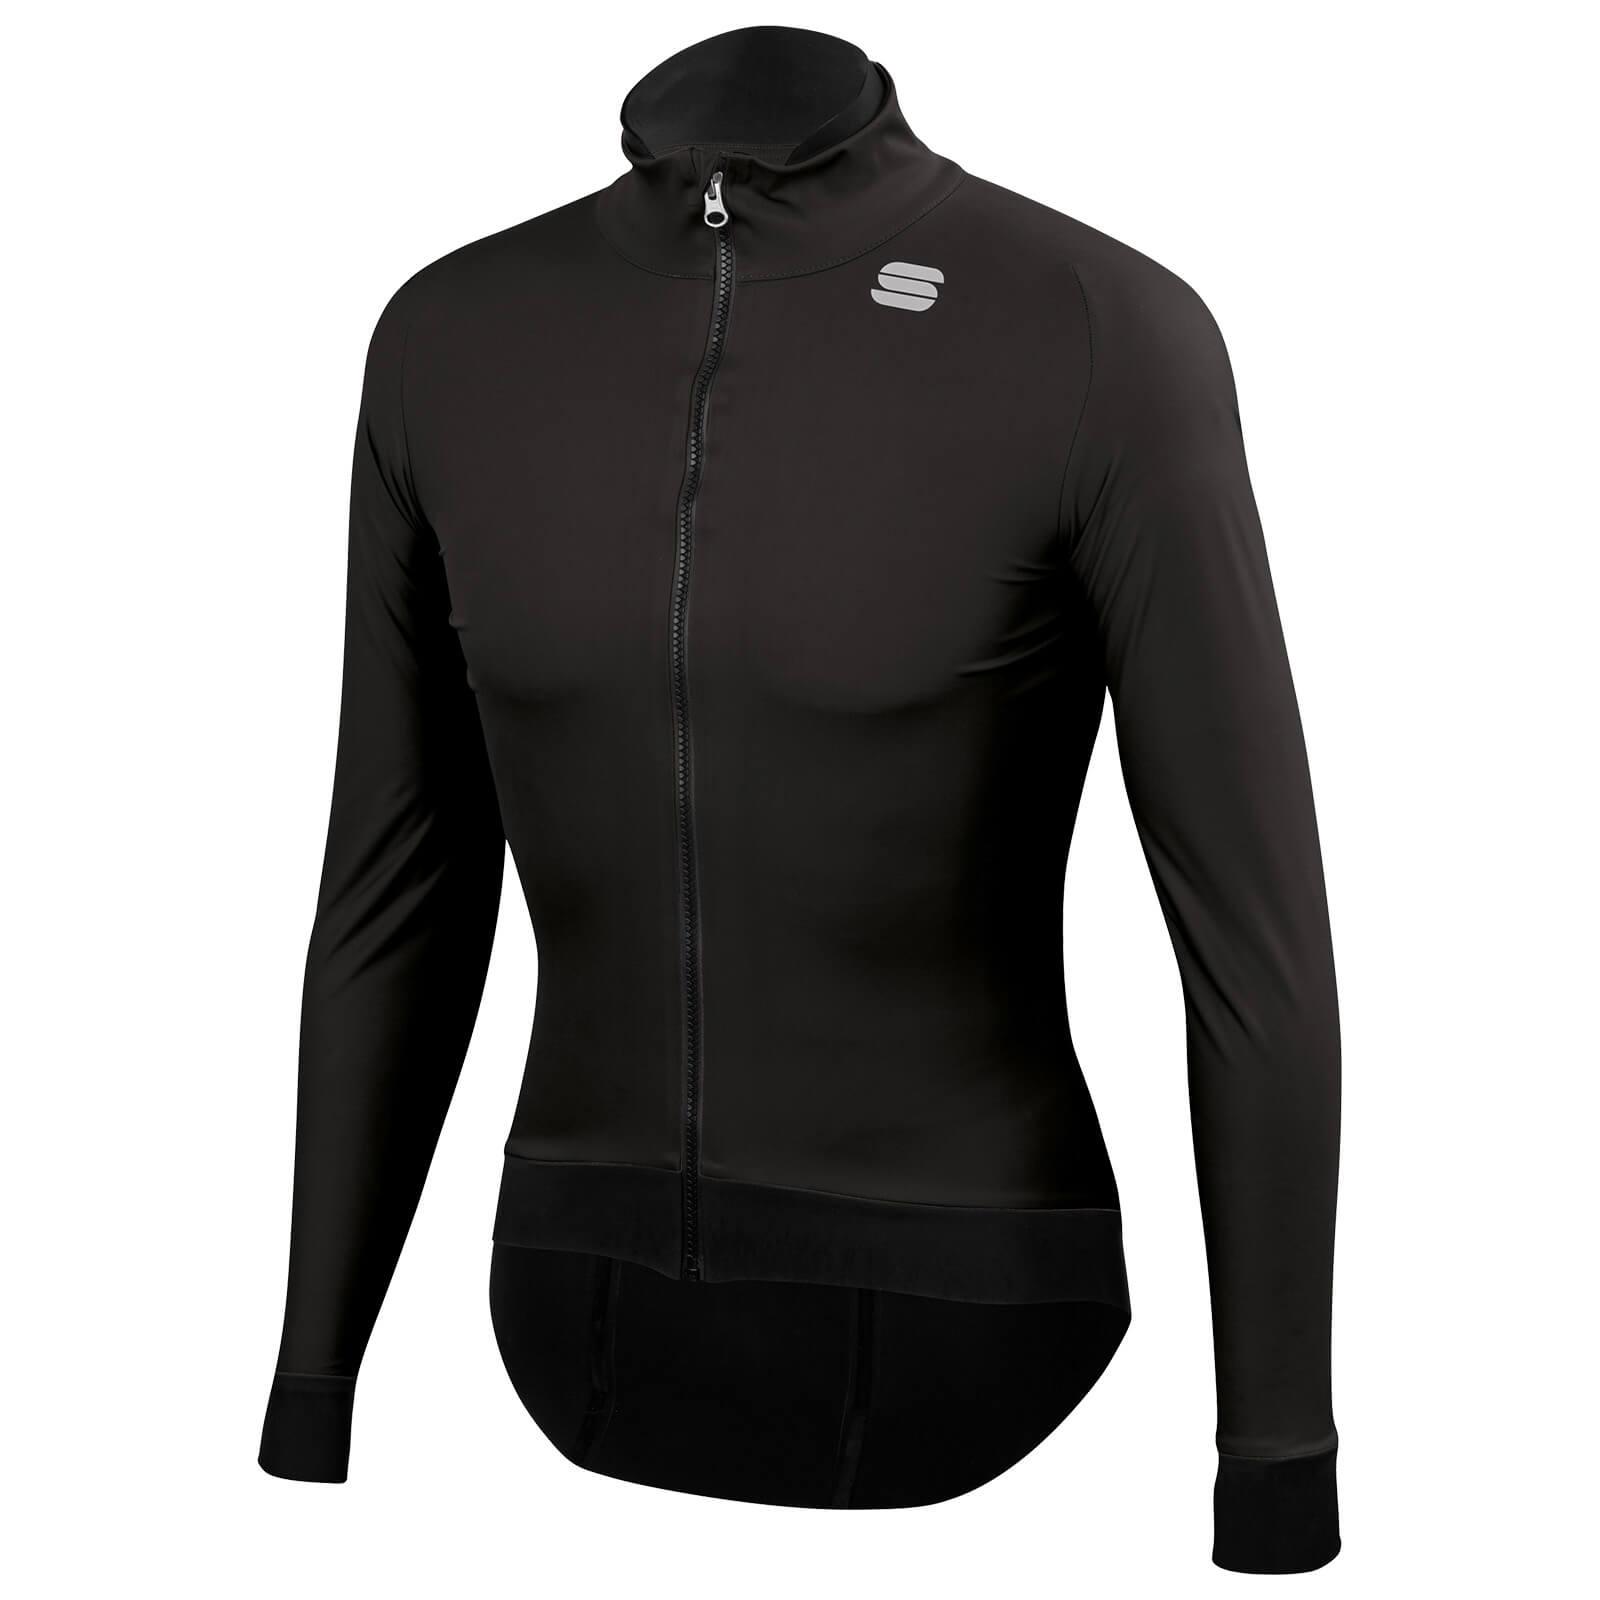 Sportful Fiandre Pro Jacket - M - Black